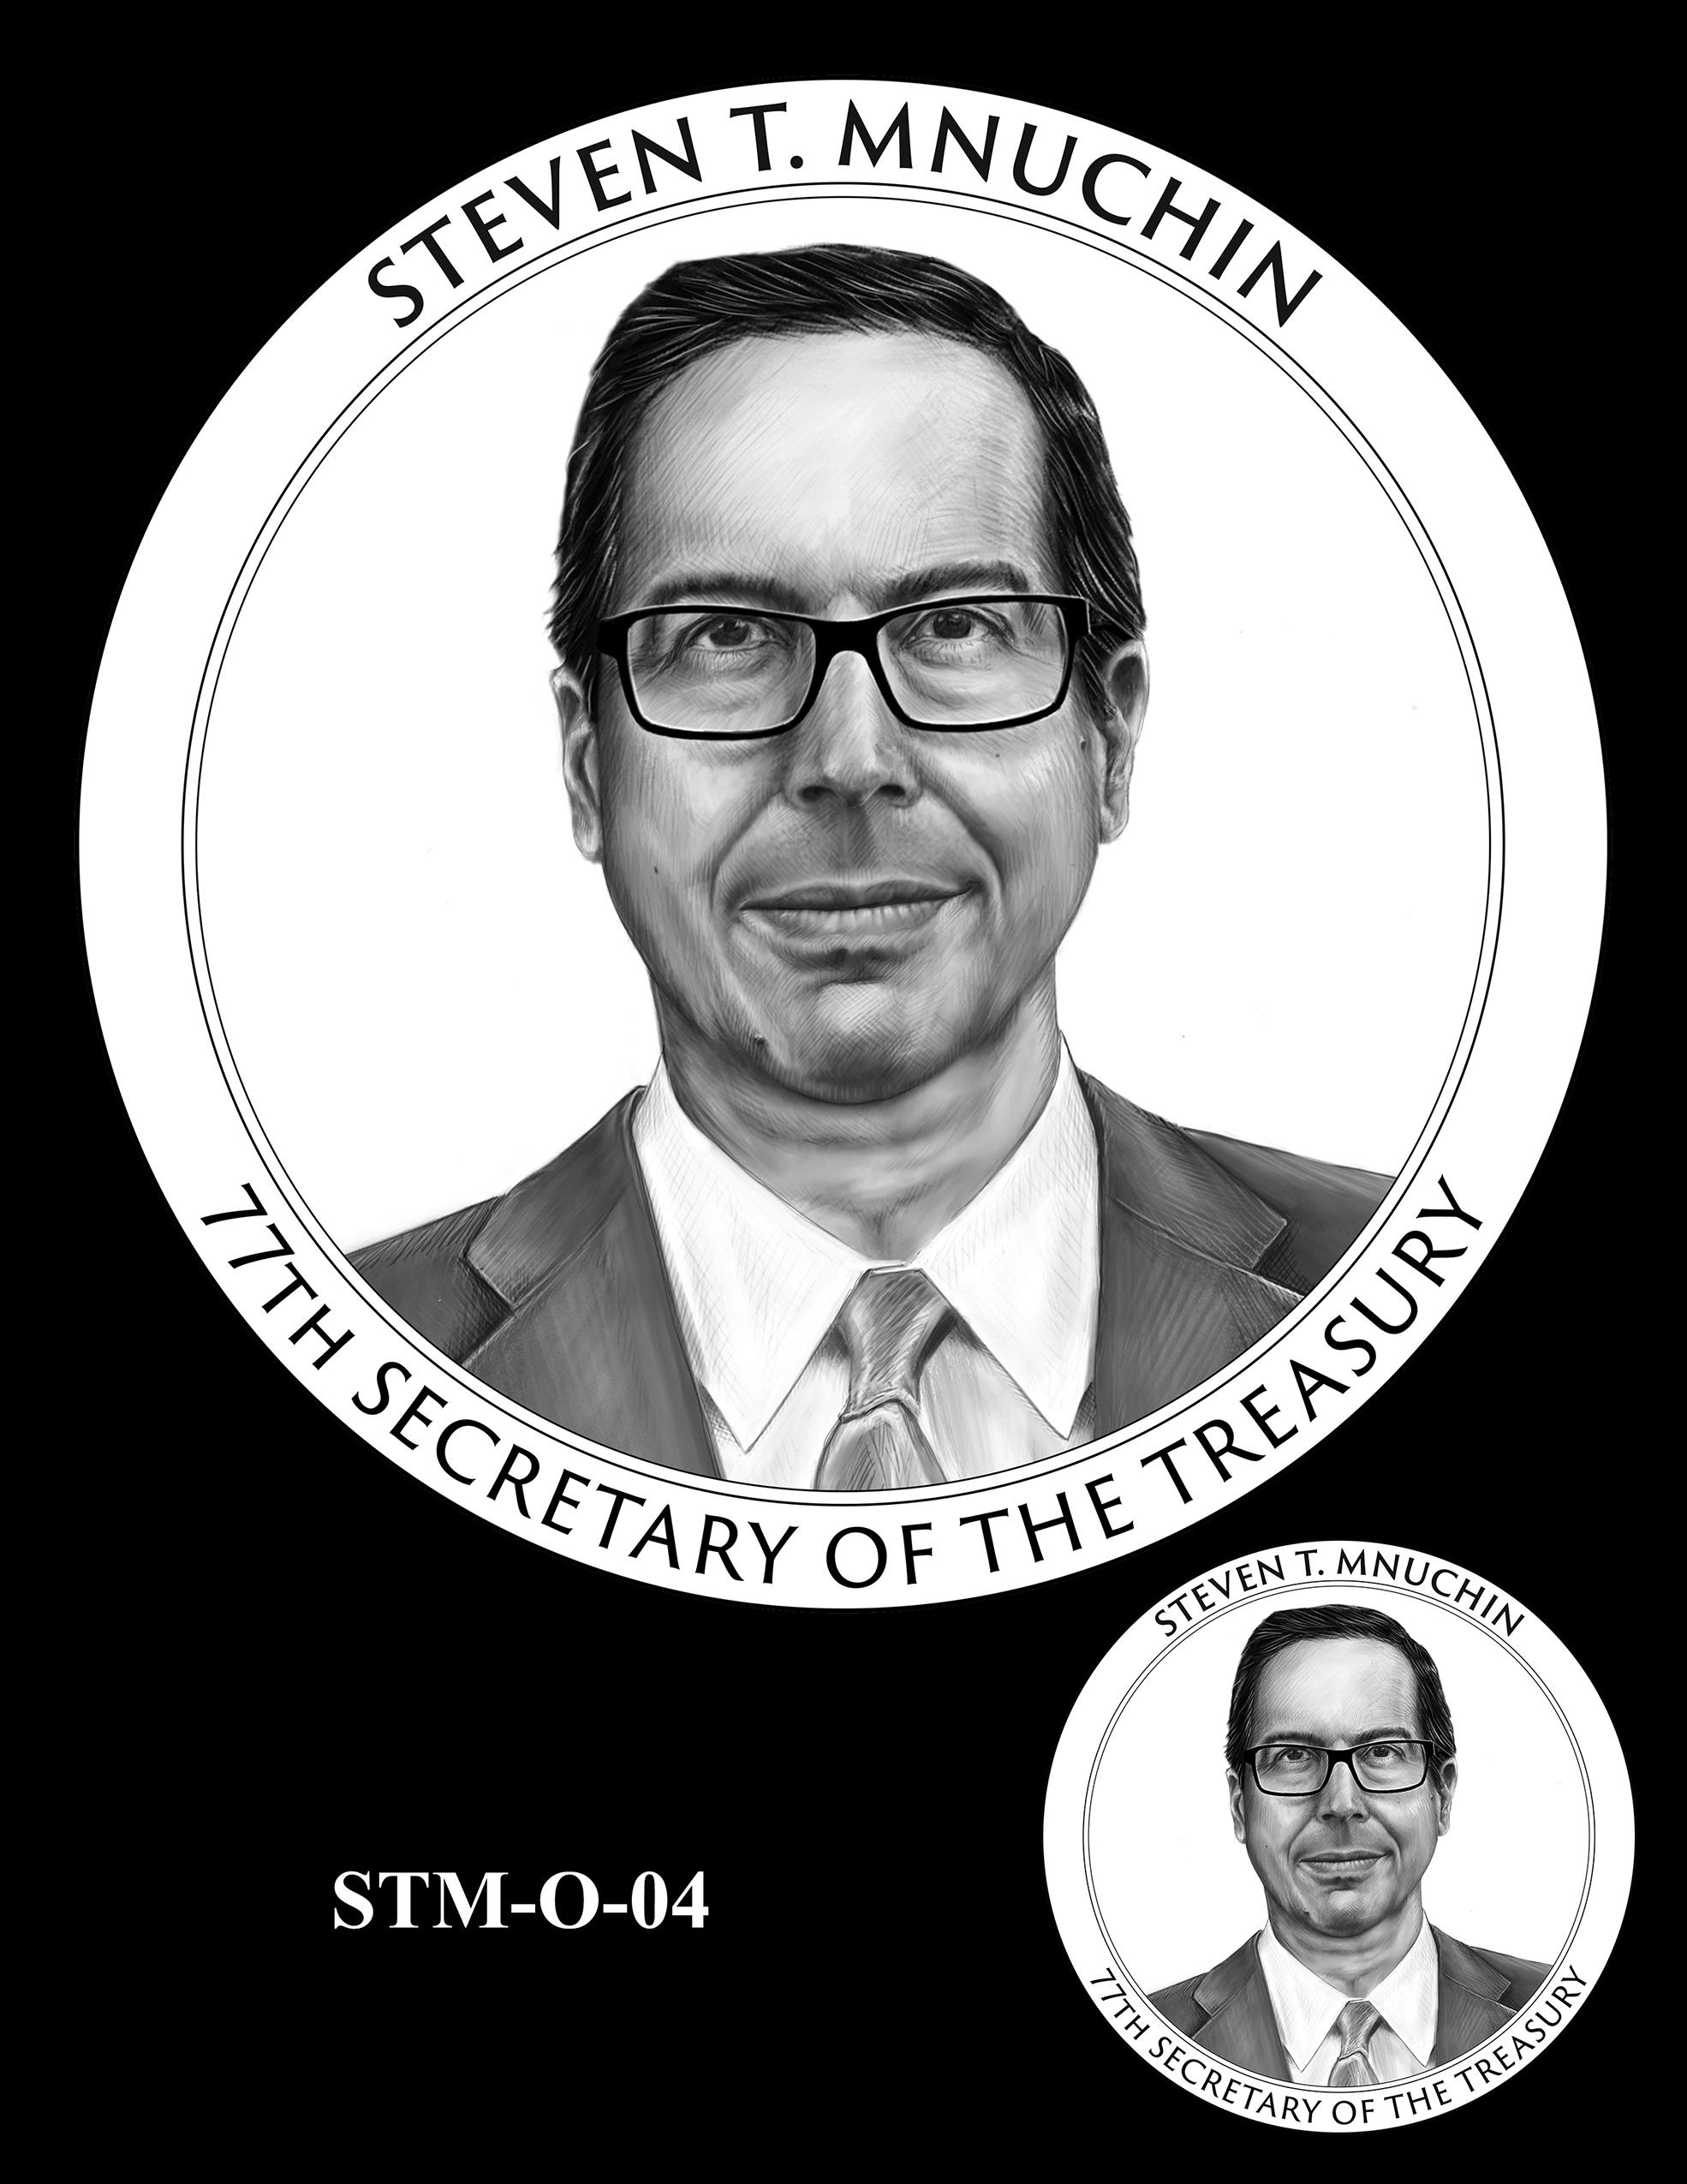 STM-O-04 -- Steven T. Mnuchin Secretary of the Treasury Medal